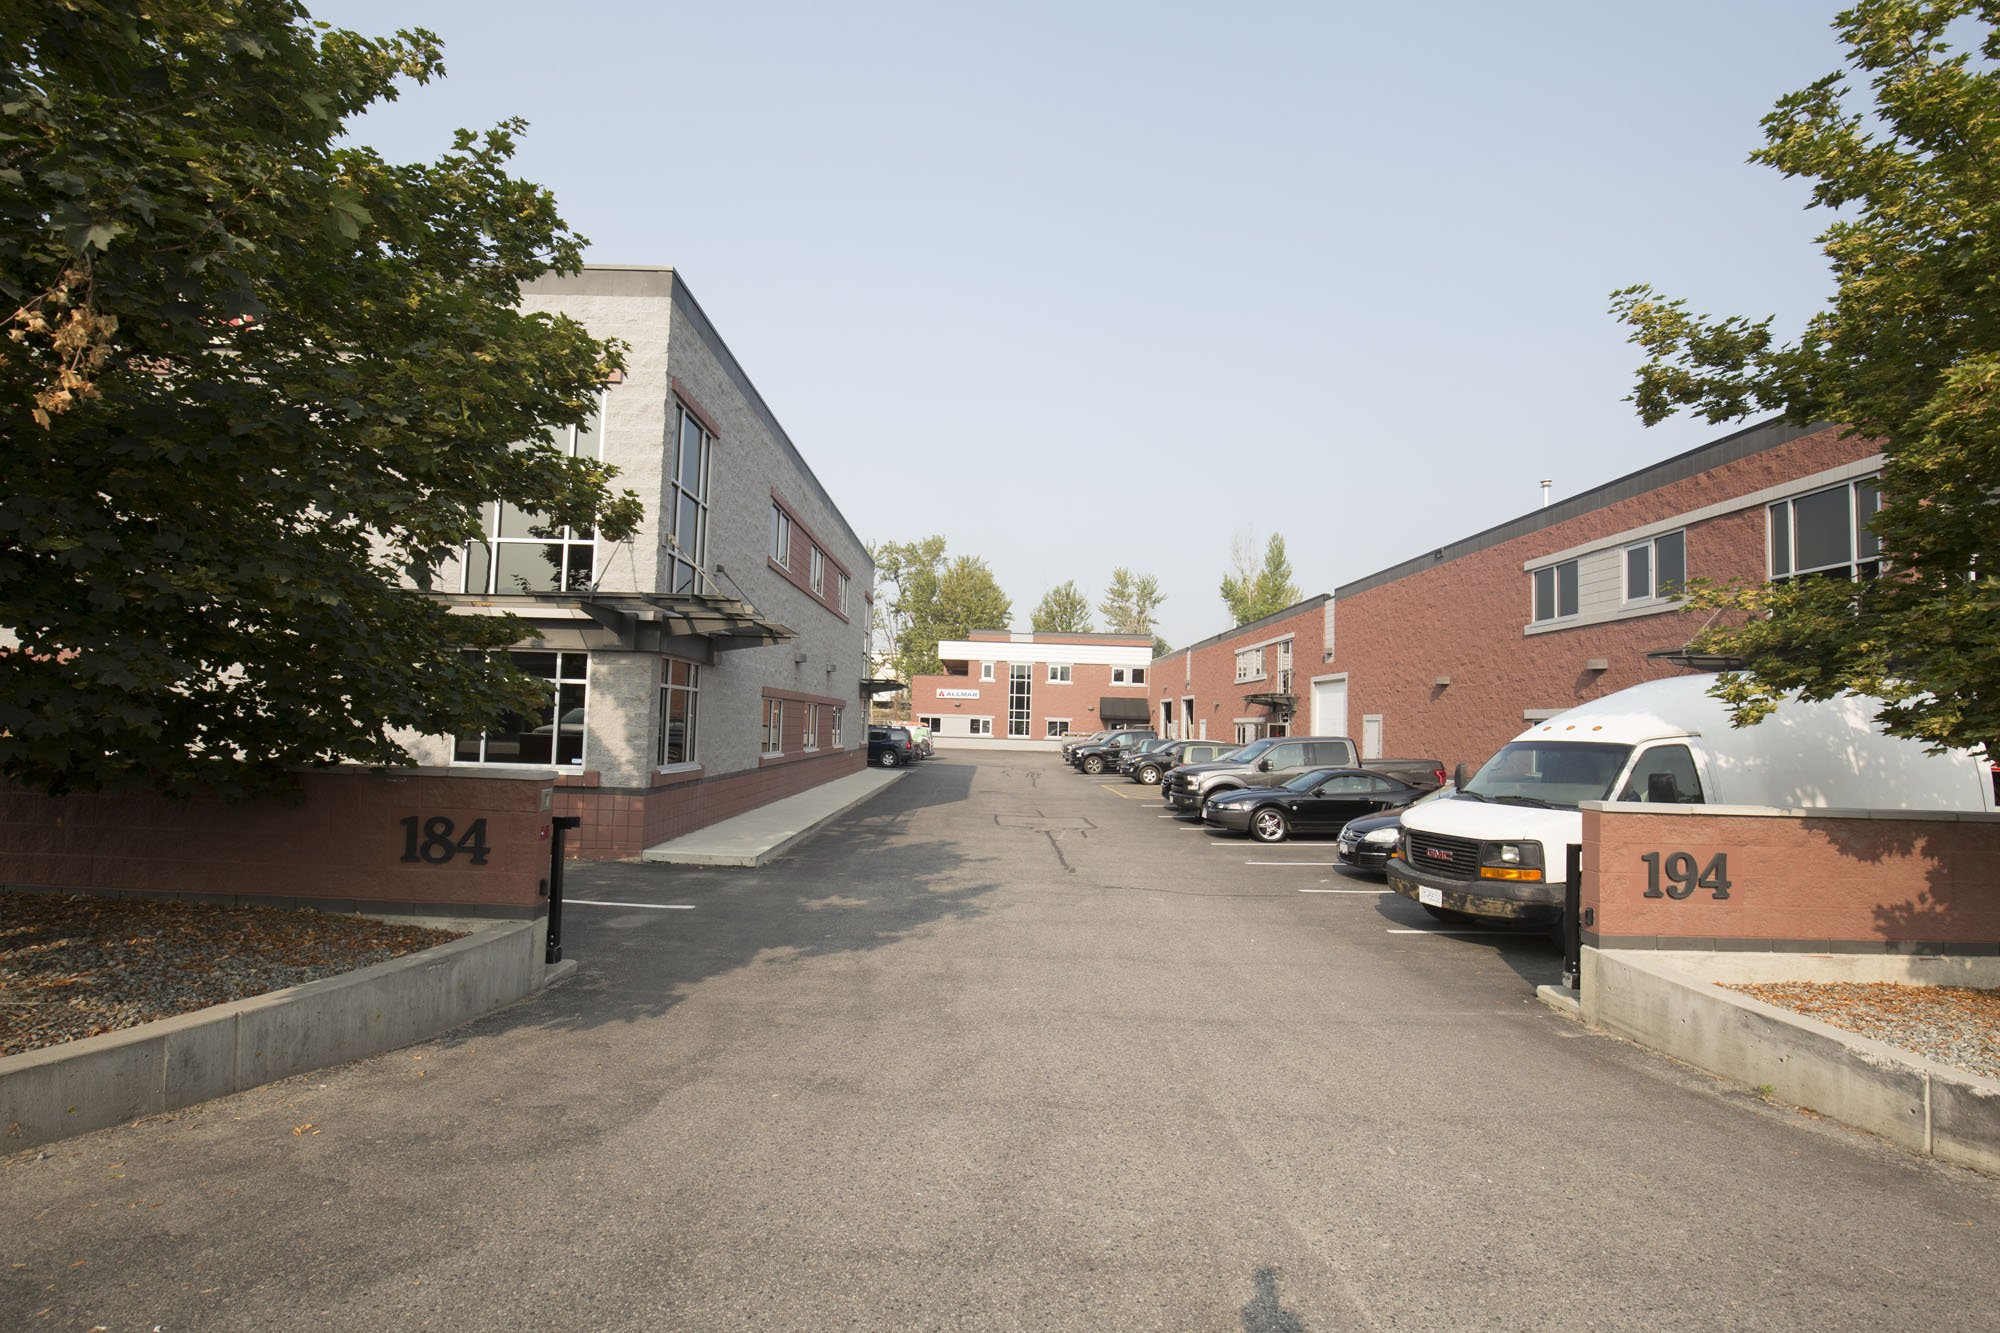 184-194 Adams Road, Kelowna, BC - Income Producing Strata Warehouse/Office Complex